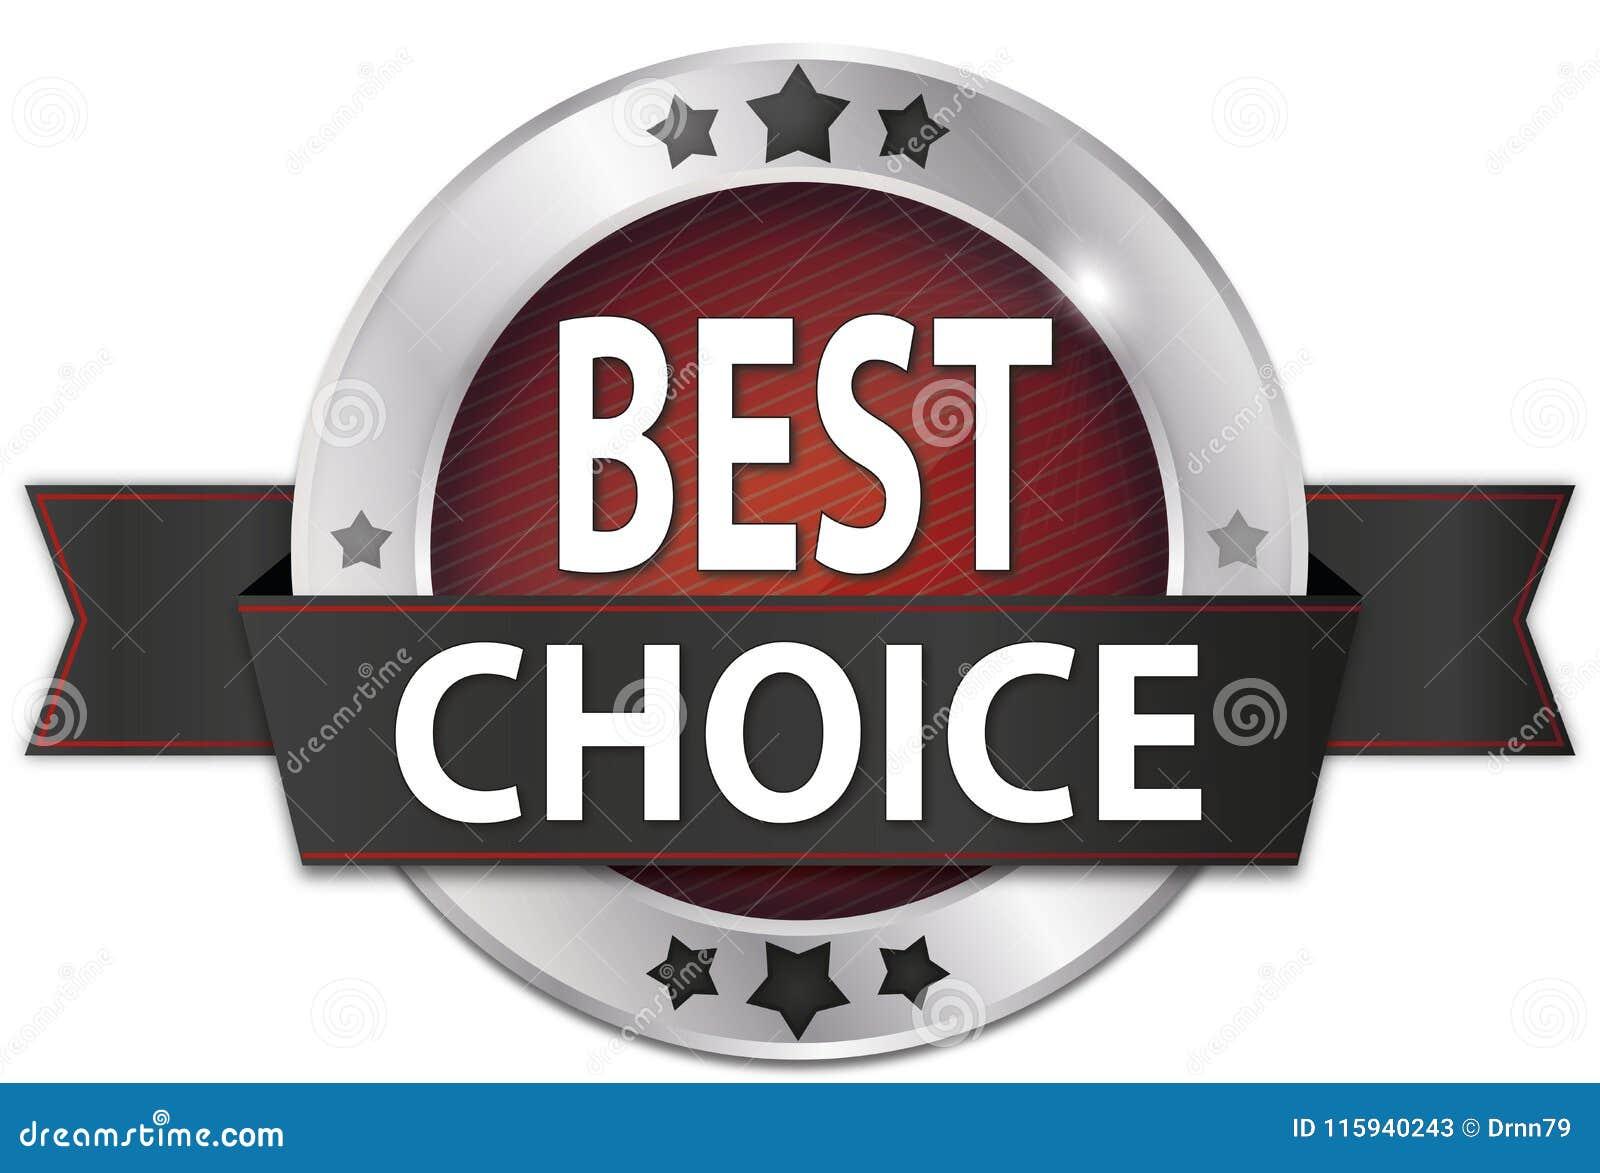 Best Choice Silver Metallic Round Seal Badge Stock Illustration ... c98abd737